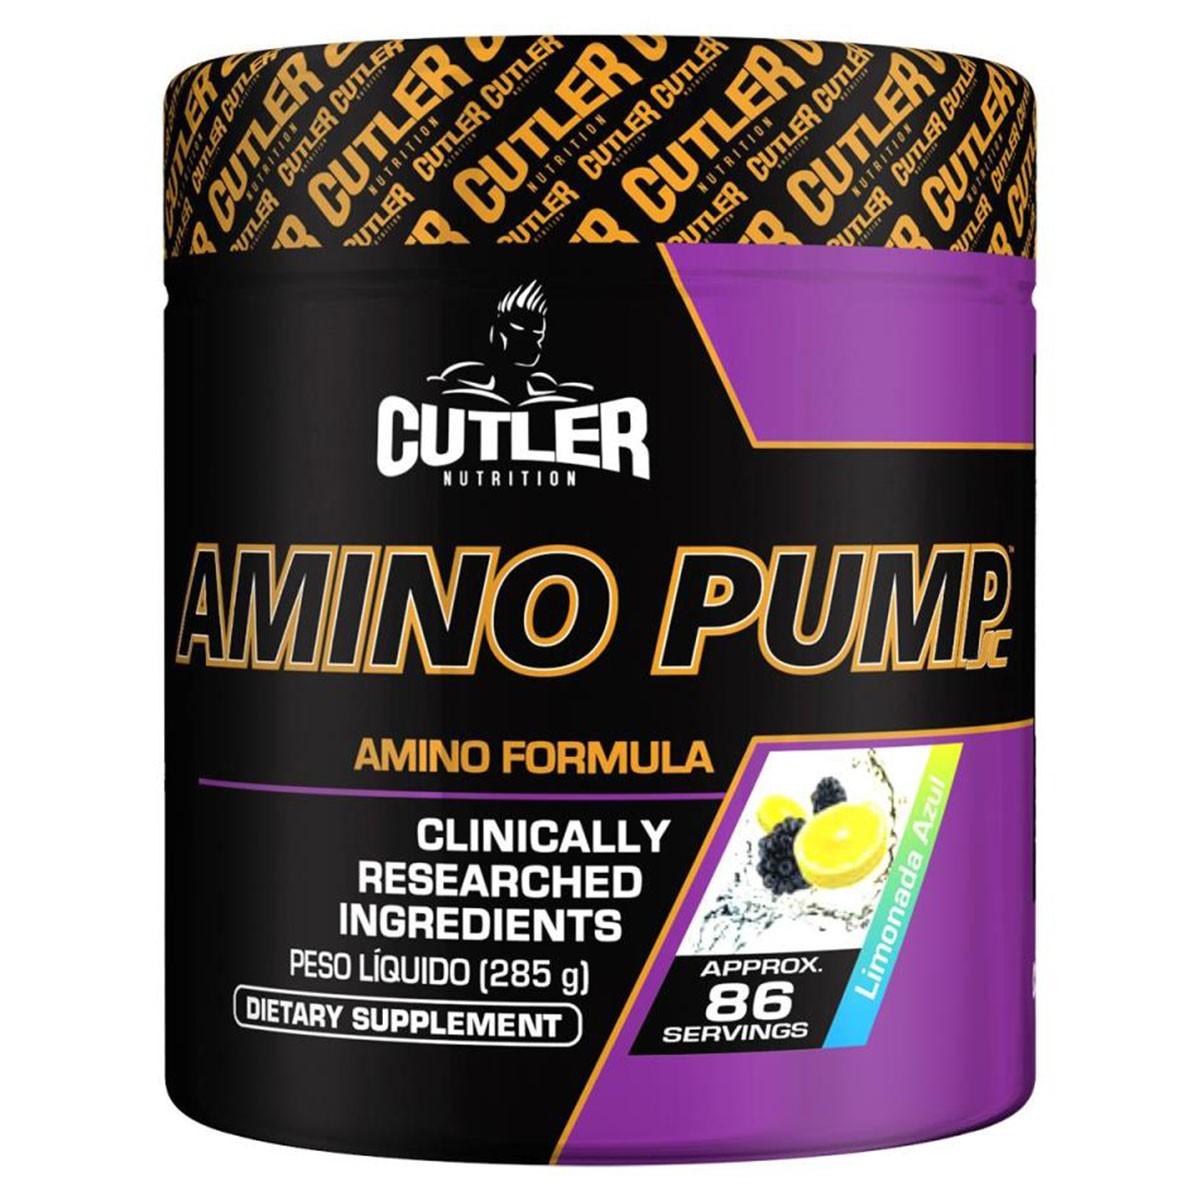 Sallutar Suplementos Amino Pump 285g